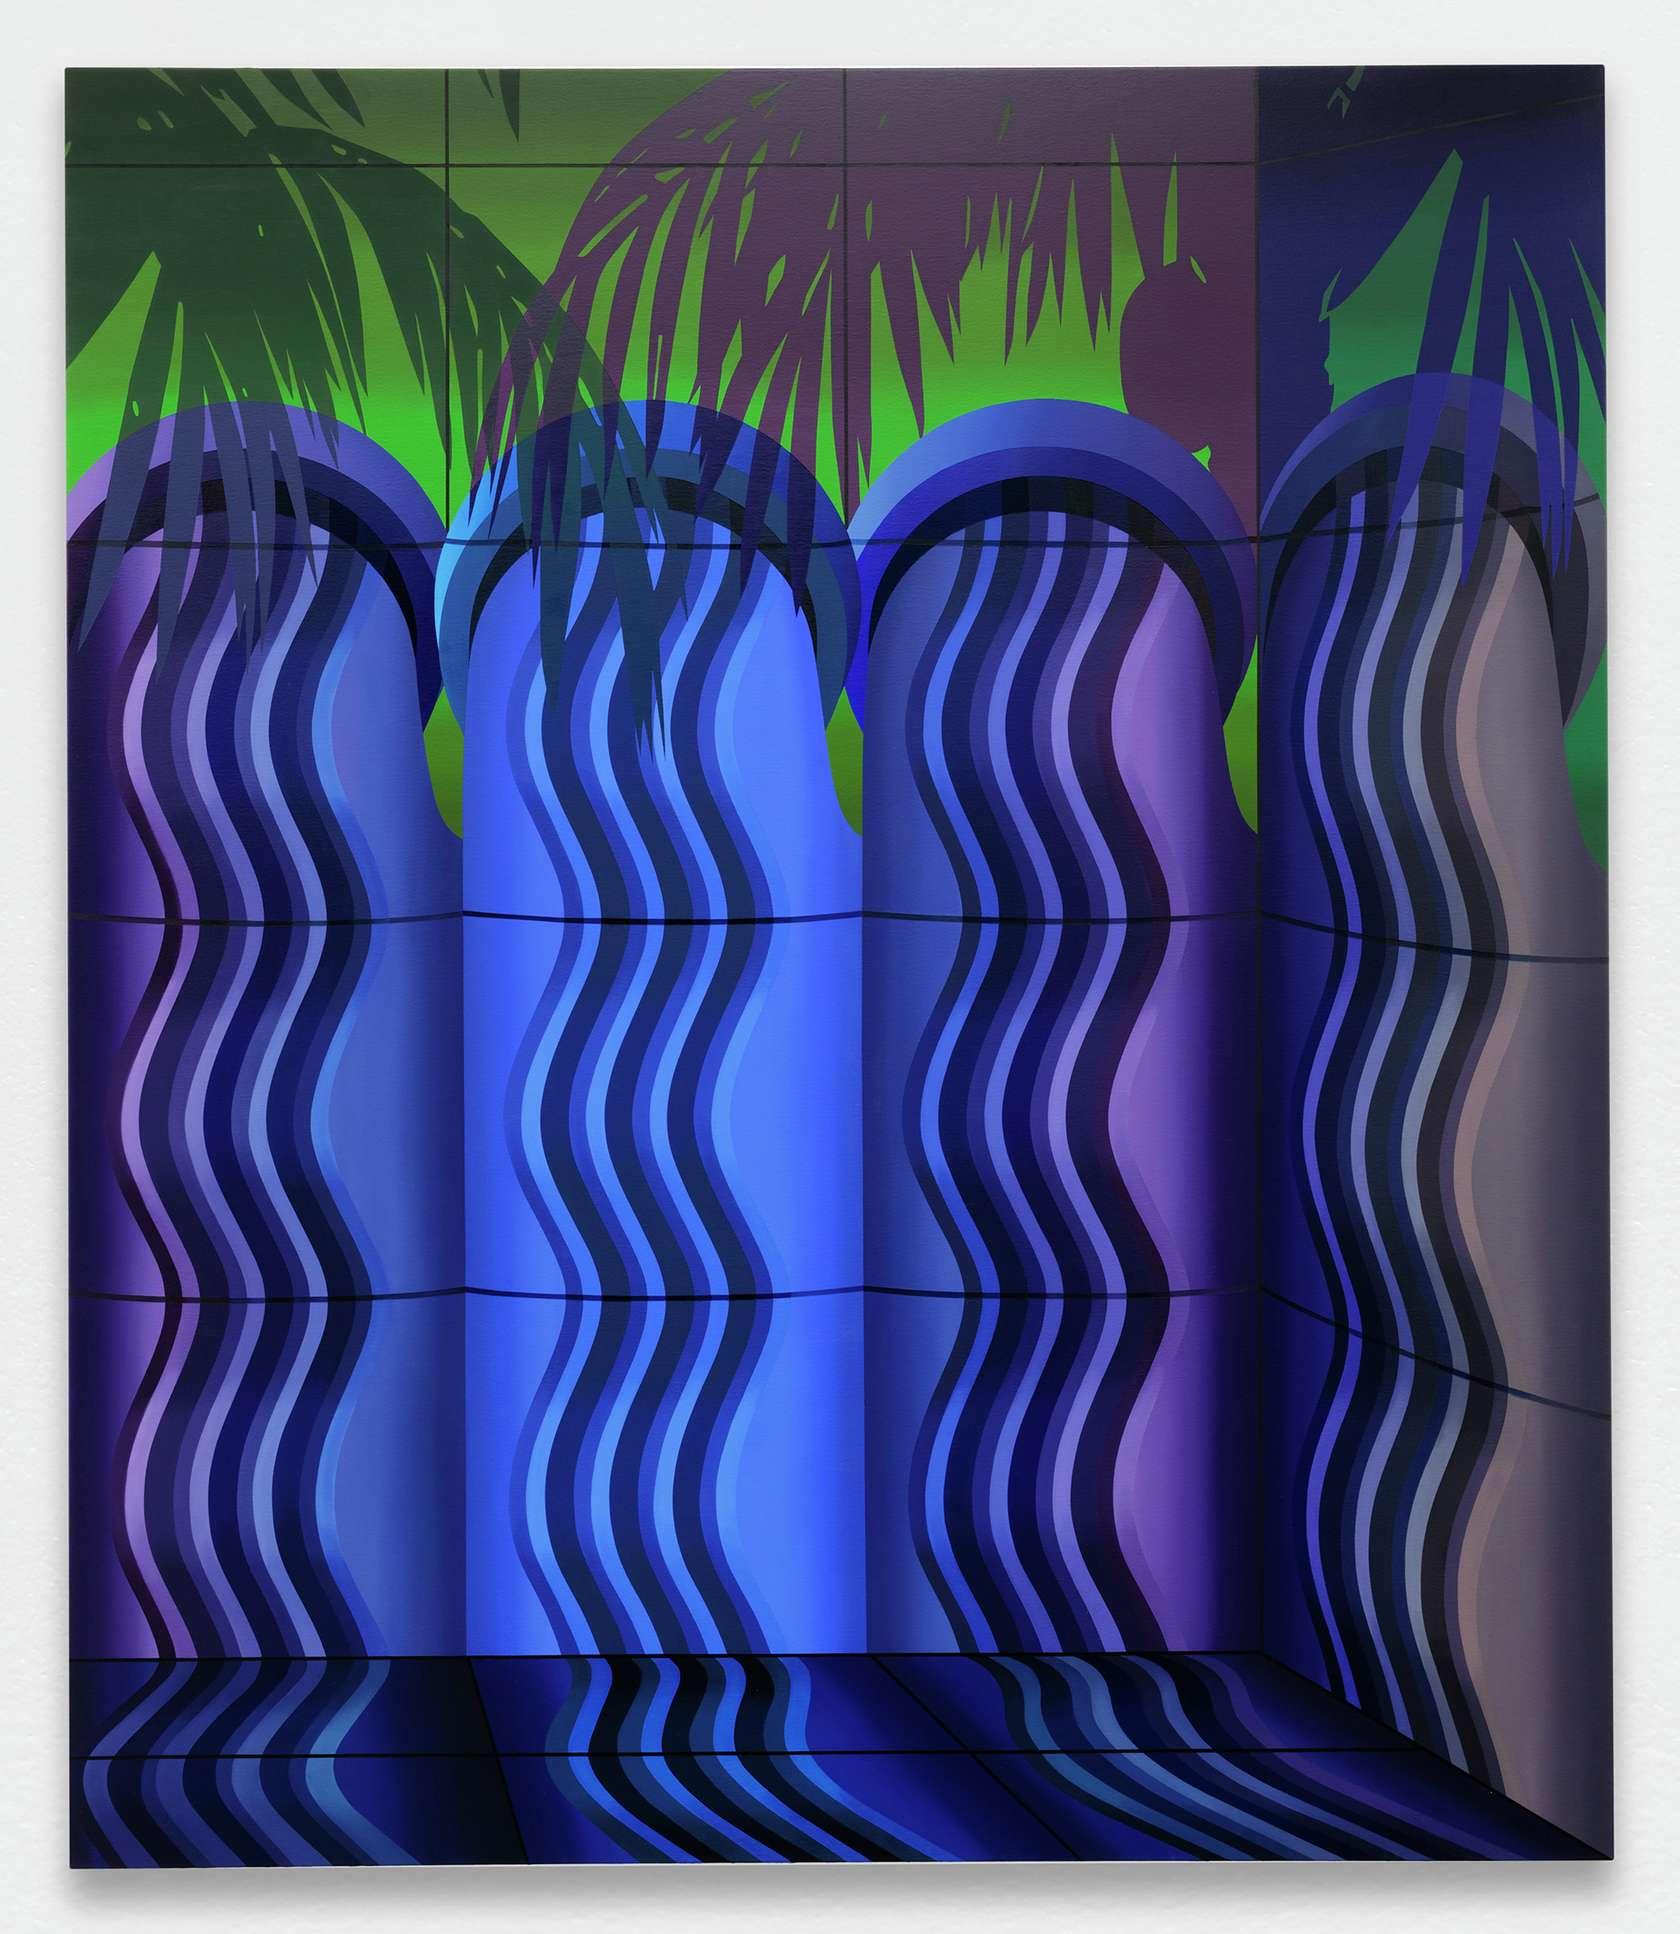 Amélie Bertrand, Waterfall, 2018 Huile sur toile140 × 120 cm / 55 1/8 × 47 2/8 in.